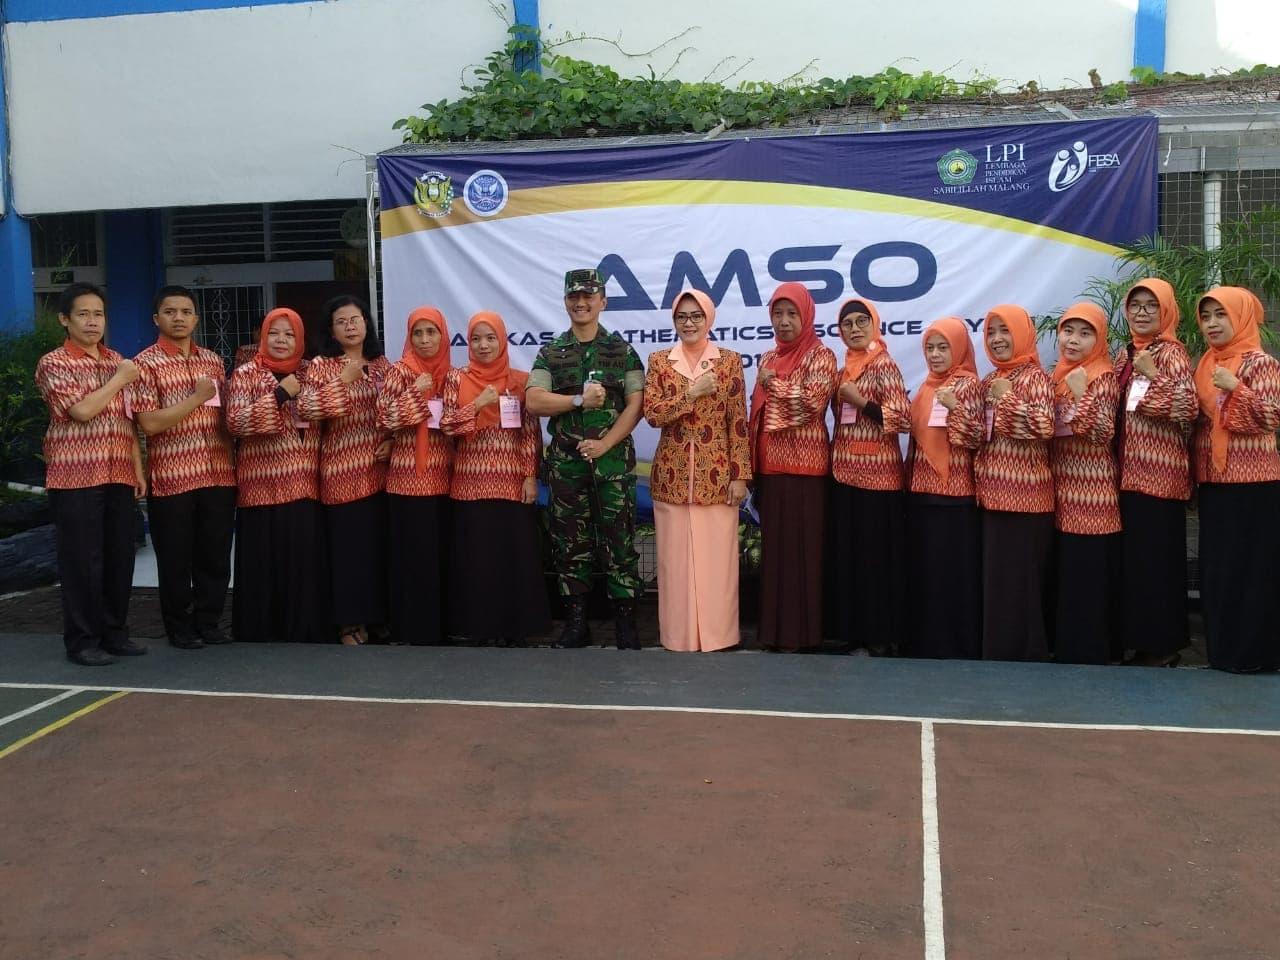 AMSO 2018 Memotivasi Siswa Jadi Kader Juara